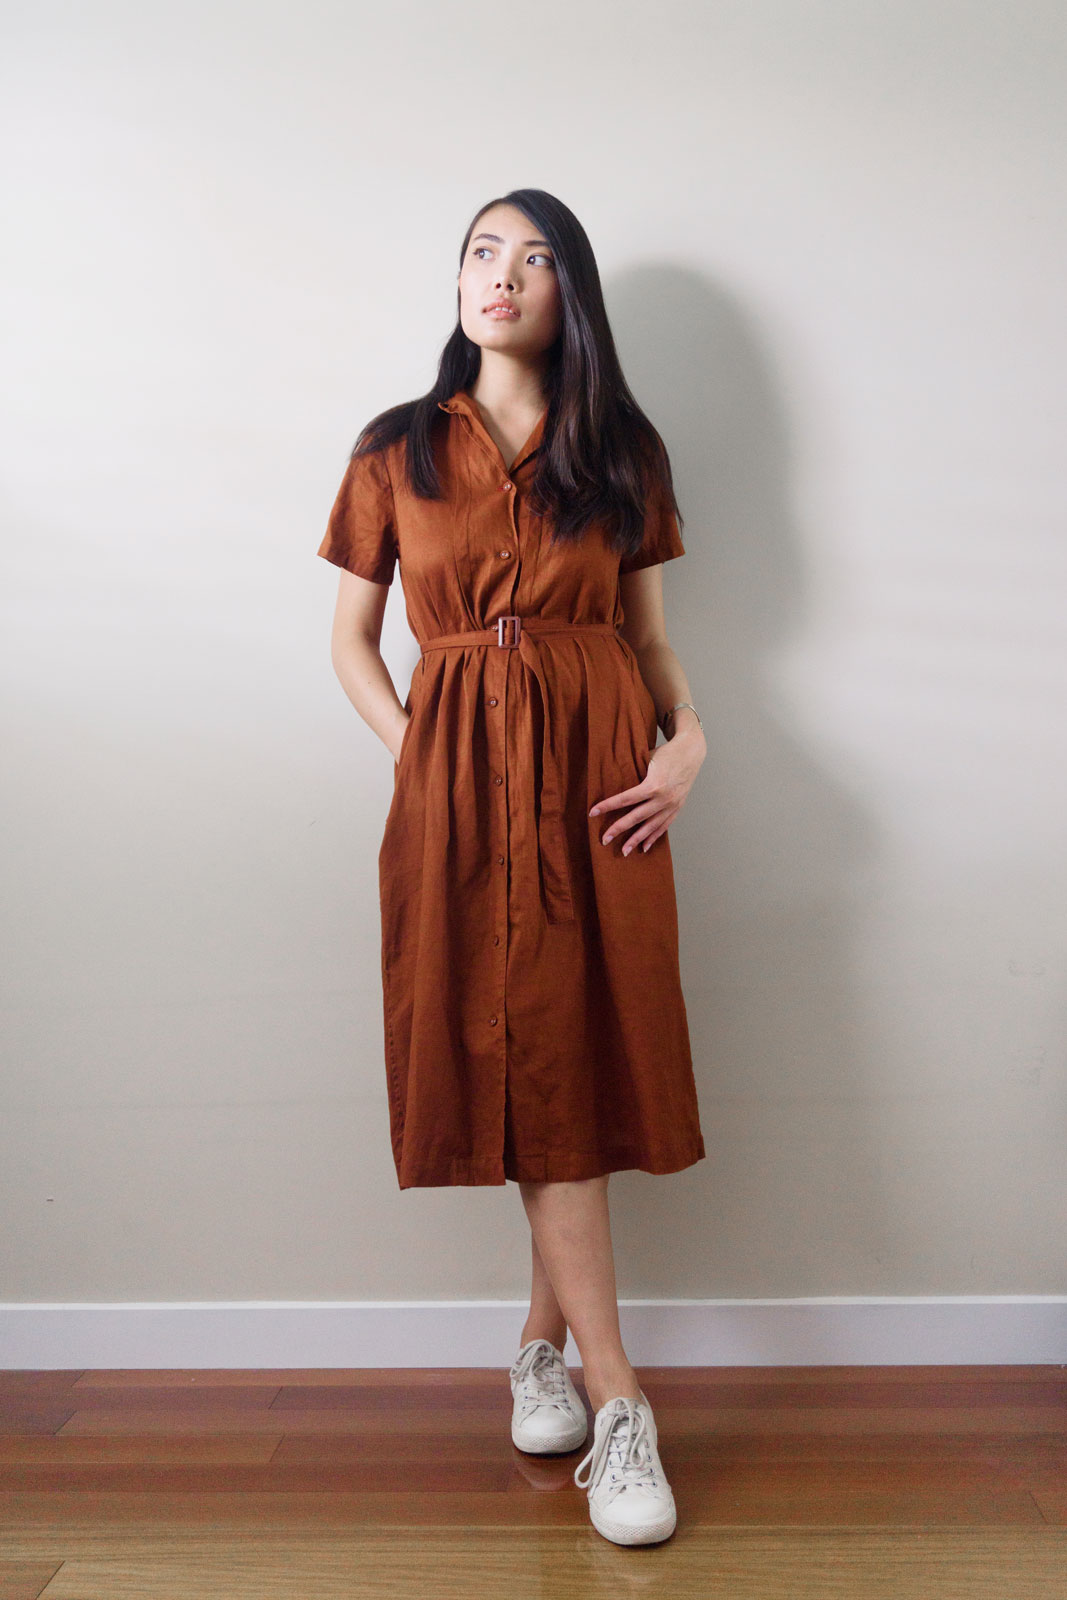 Uniqlo IDLF shirt dress